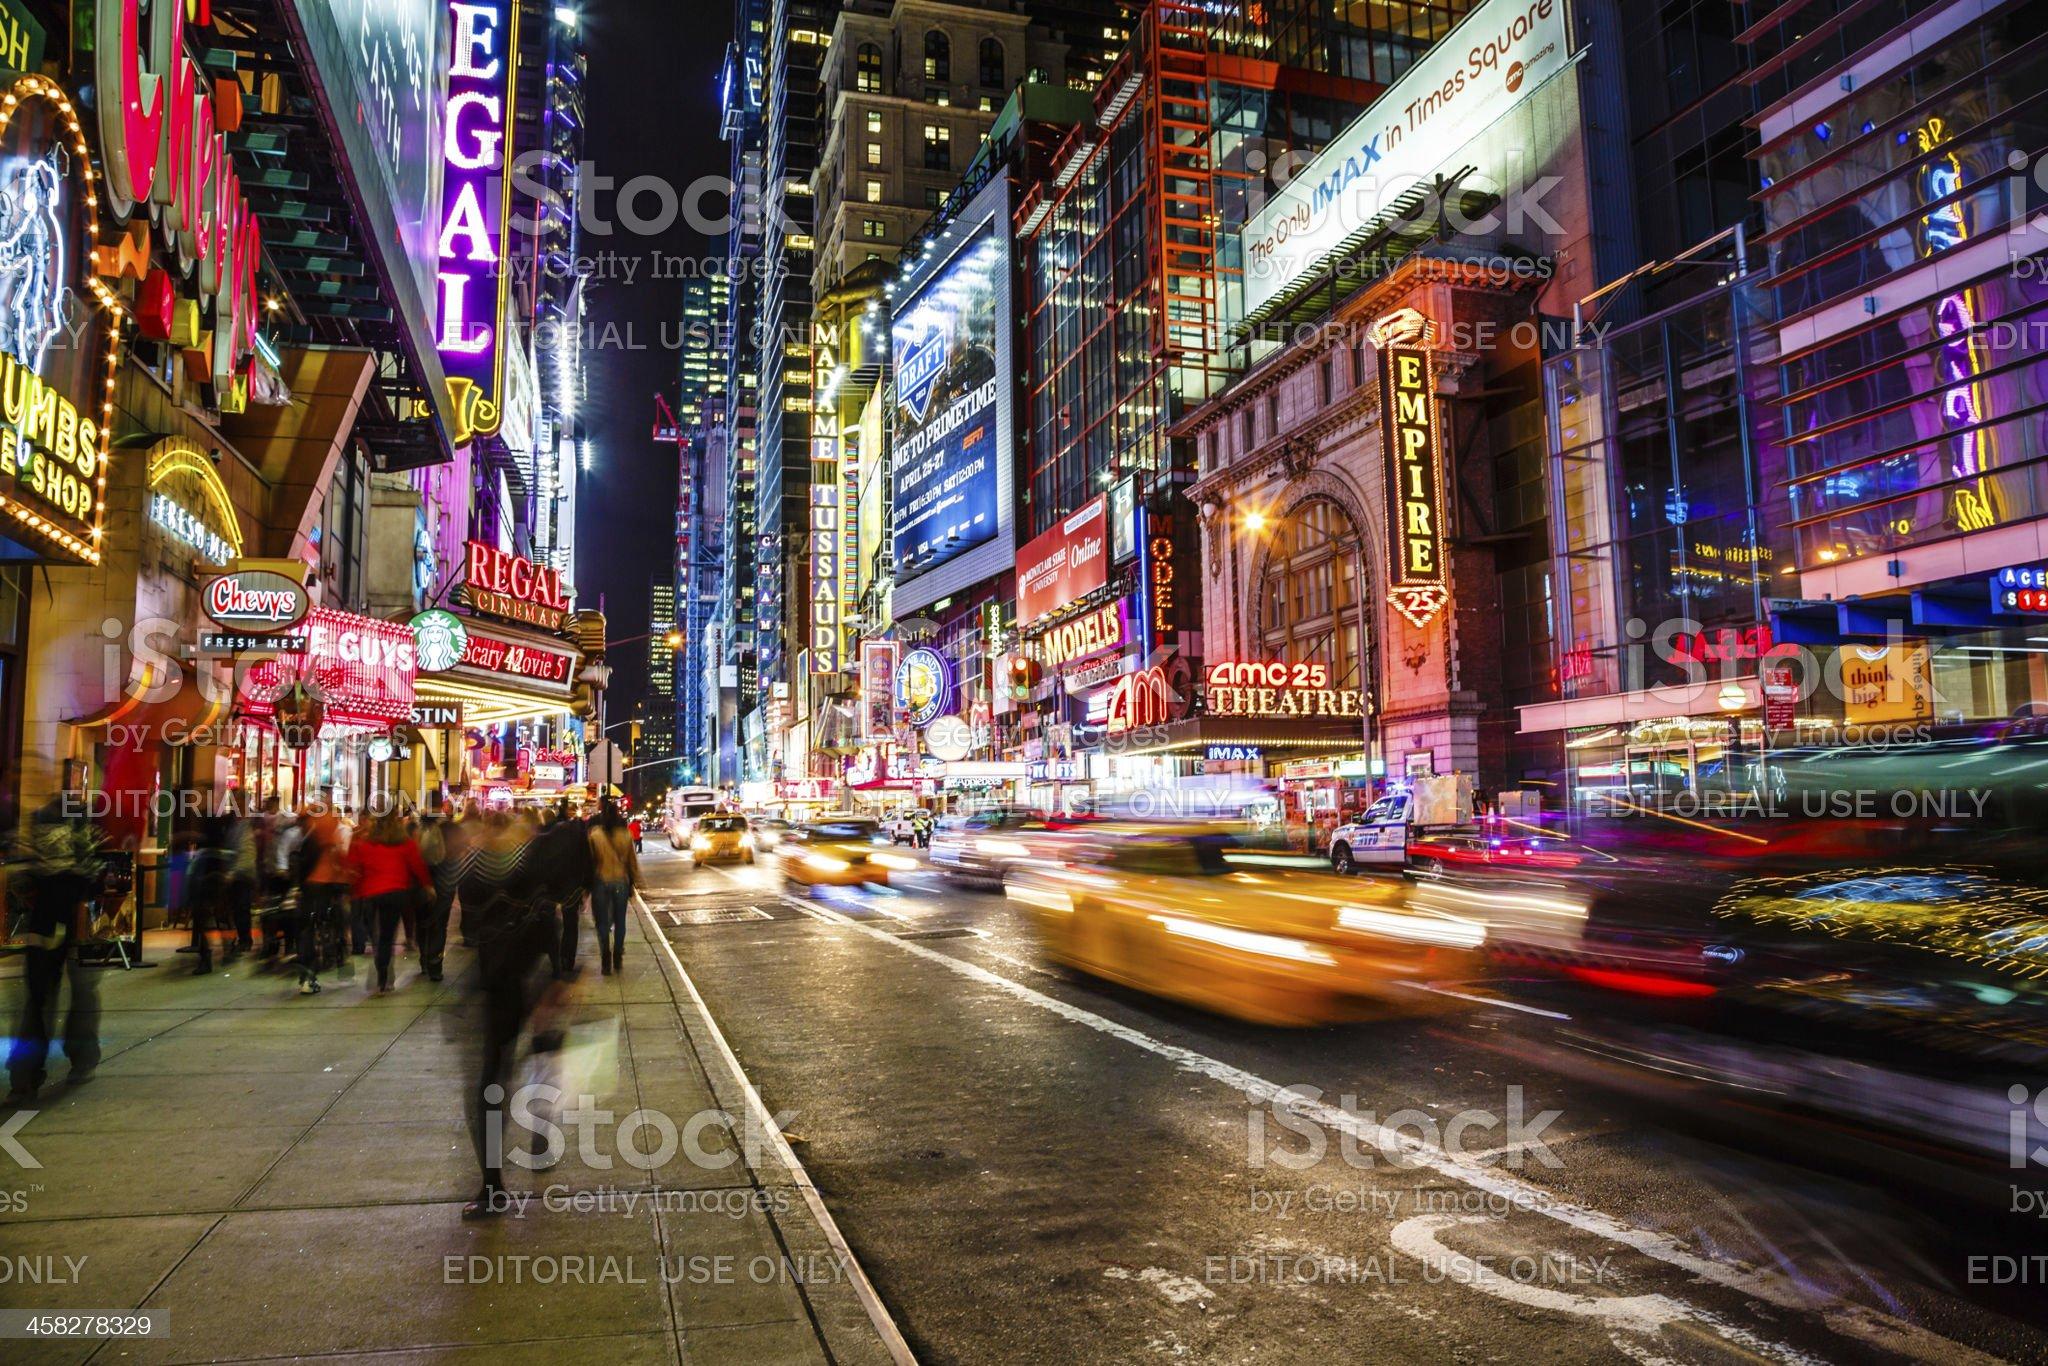 42nd street at night, New York City, USA royalty-free stock photo